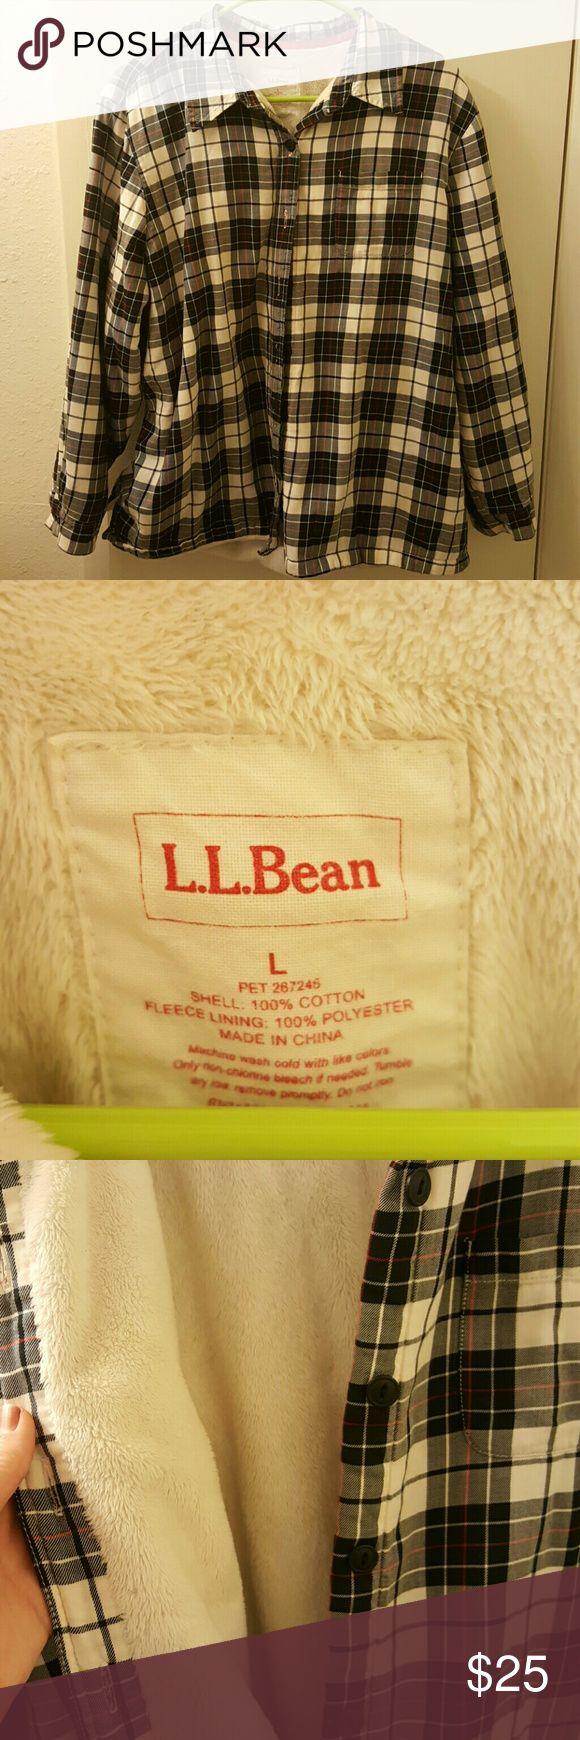 L.L Bean Womens Flannel Jacket Soft 100% polyester Fleece lining   Shell is 100% cotton L.L. Bean Jackets & Coats